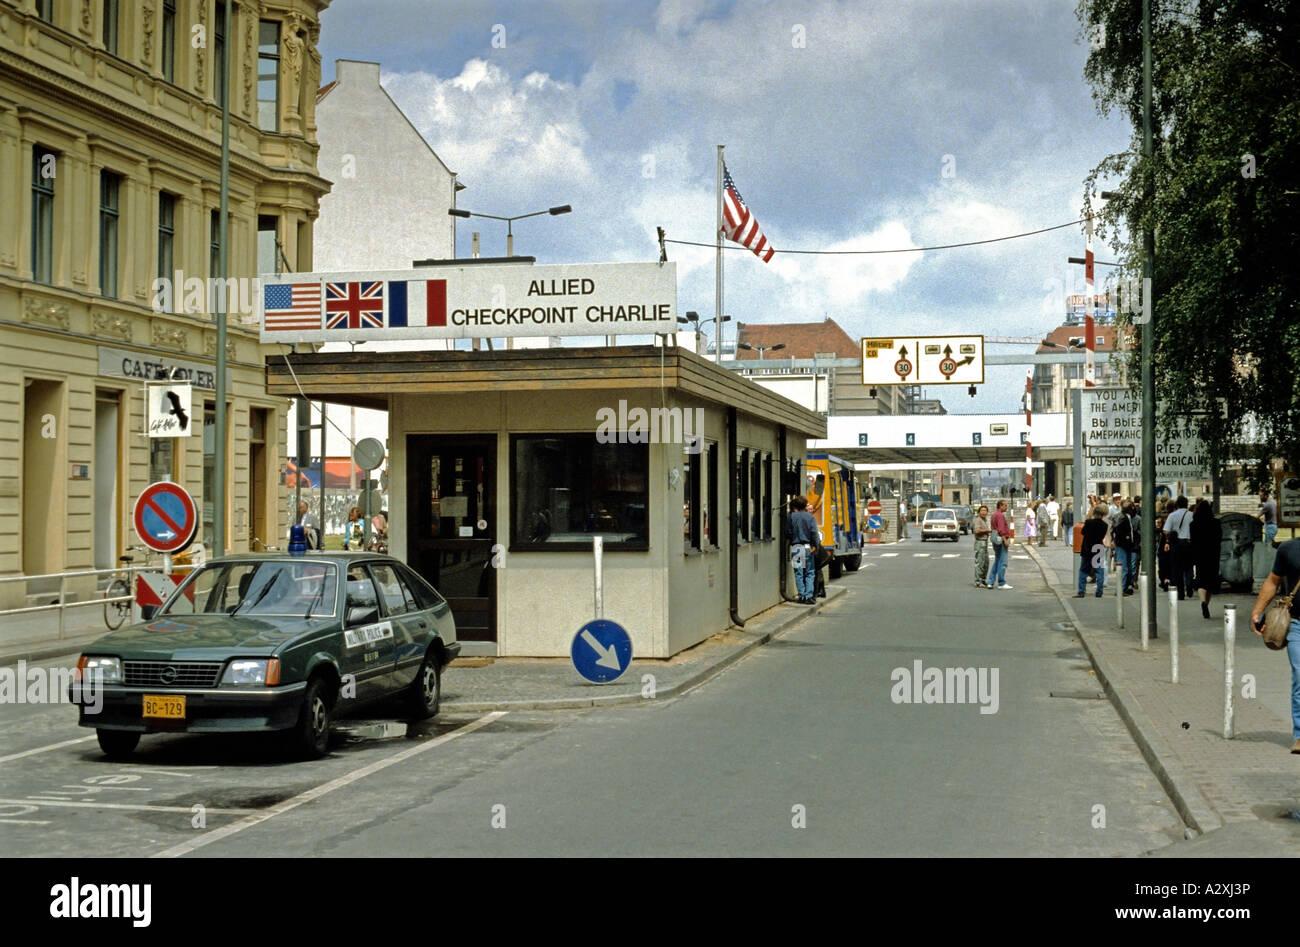 Allied Checkpoint Charlie, c. 1990, Berlín, Alemania Imagen De Stock